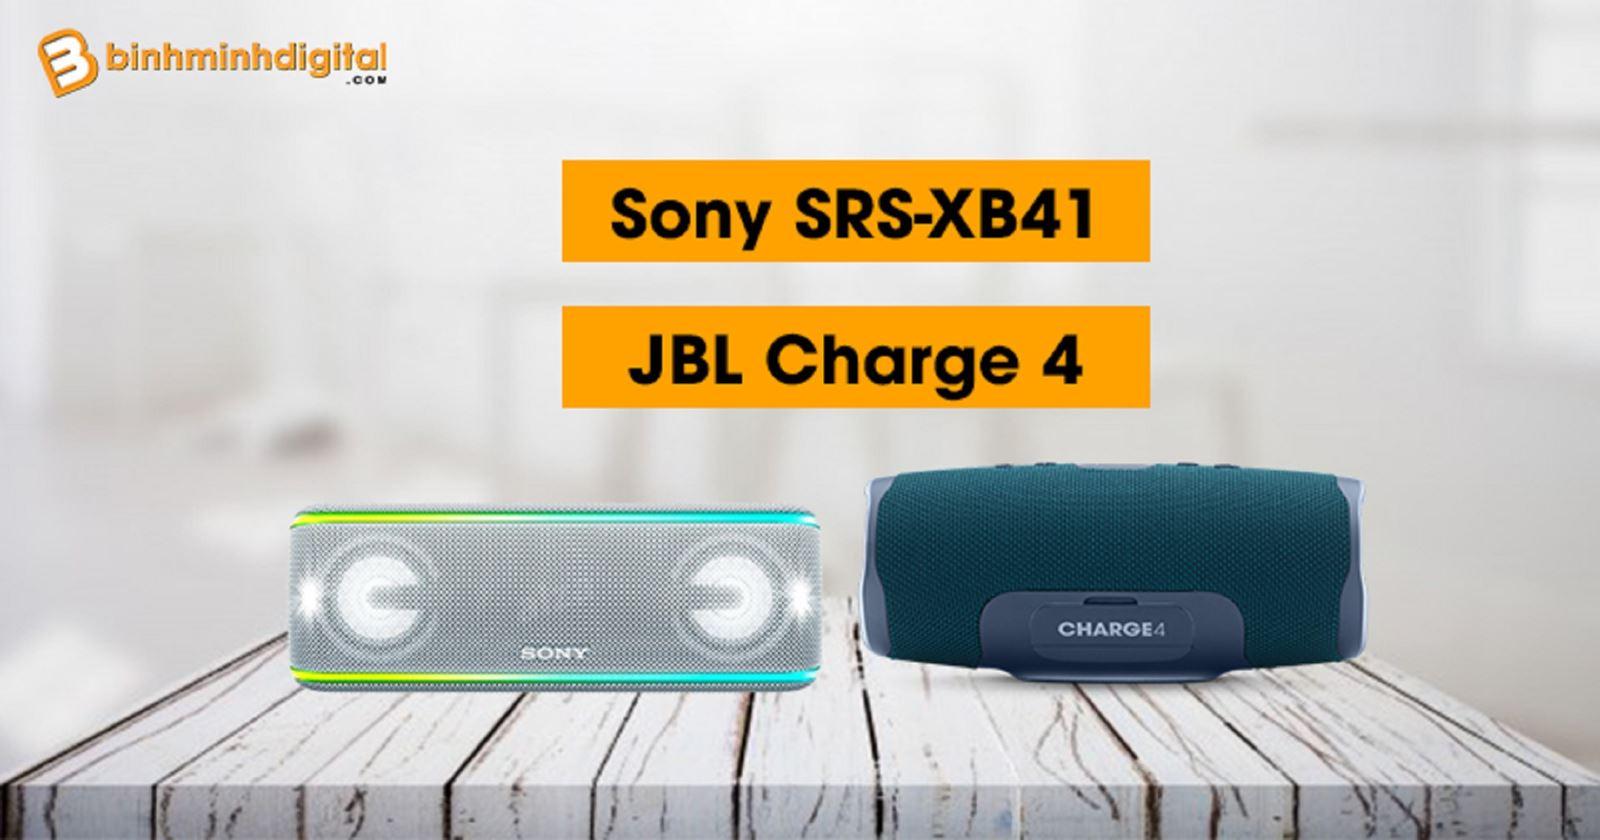 So sánh Sony SRS-XB41 vsJBL Charge 4